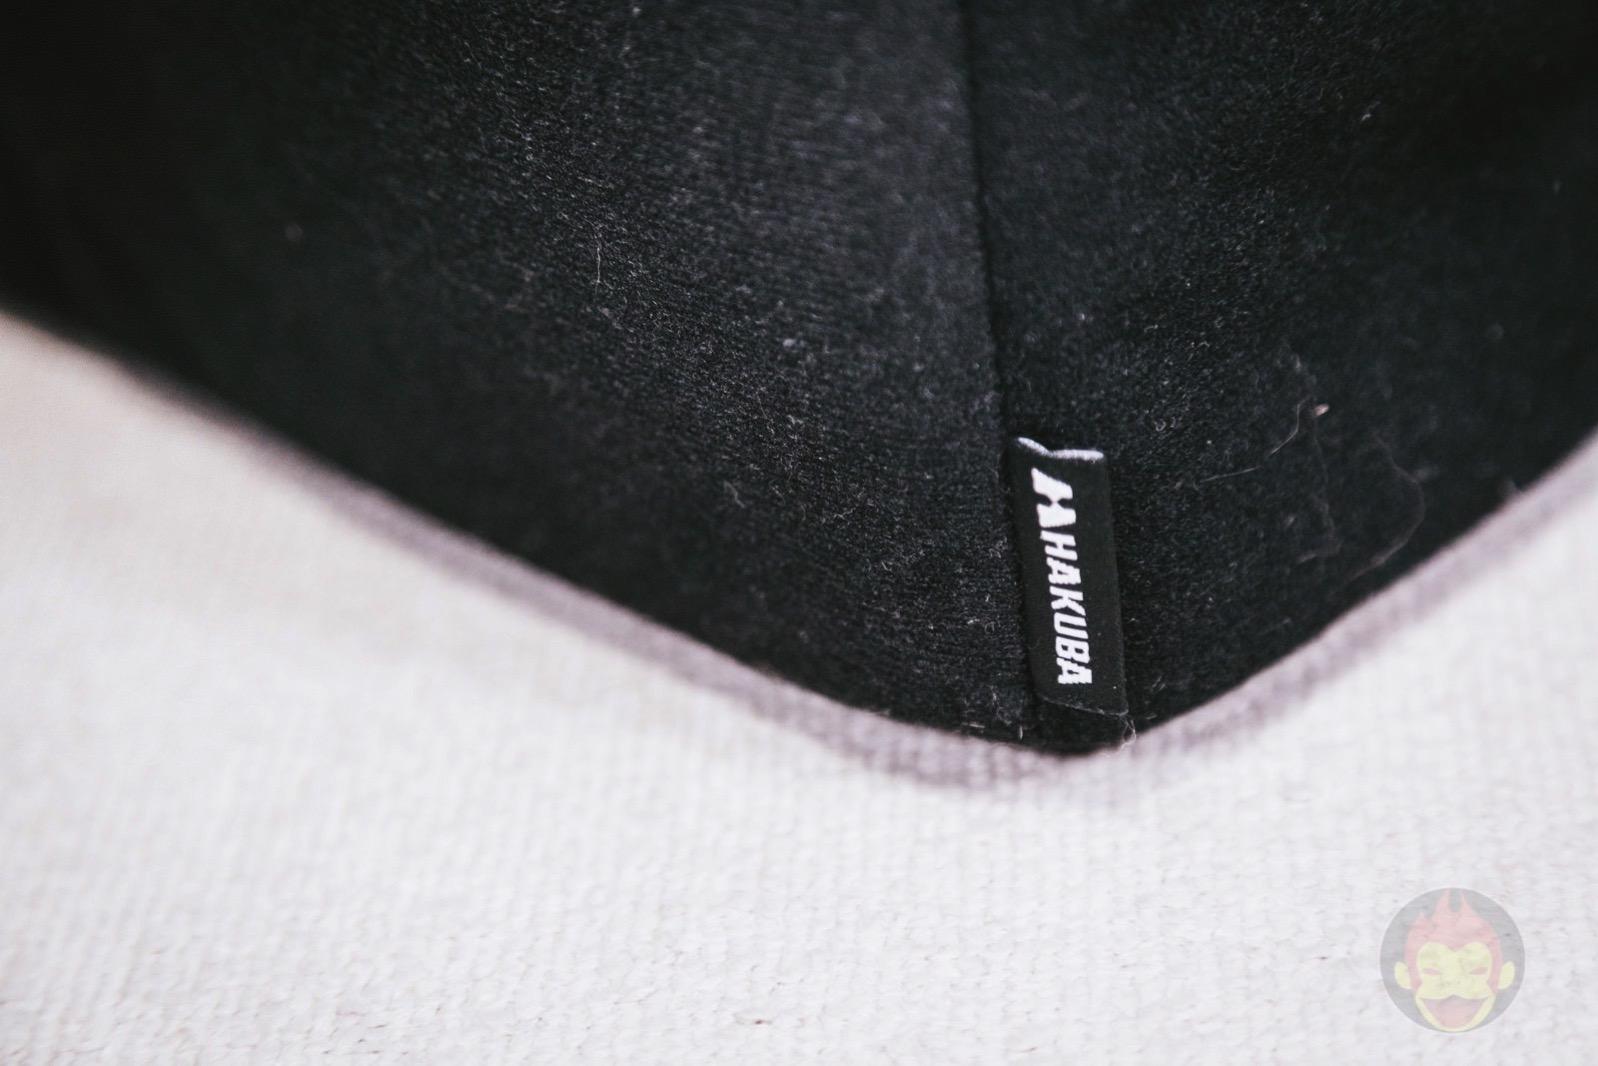 Hakuba-Camerabag-Innerbox-Review-06.jpg